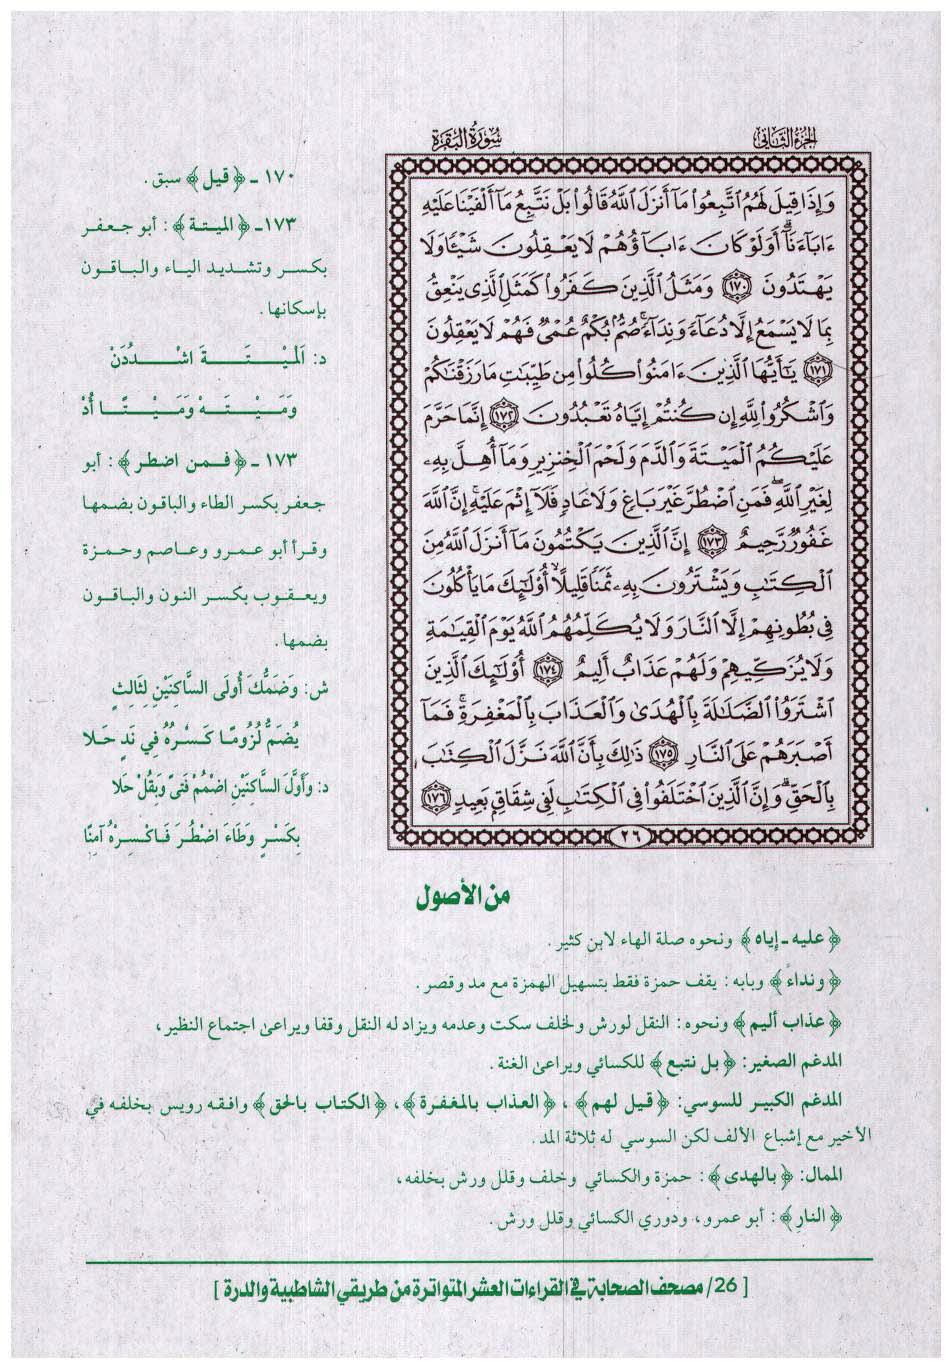 Pin By القران الكريم The Holy Quran On مصحف الصحابة في القراءات العشر المتواترة من طريق الشاطبية والدرة Bullet Journal Journal Notebook